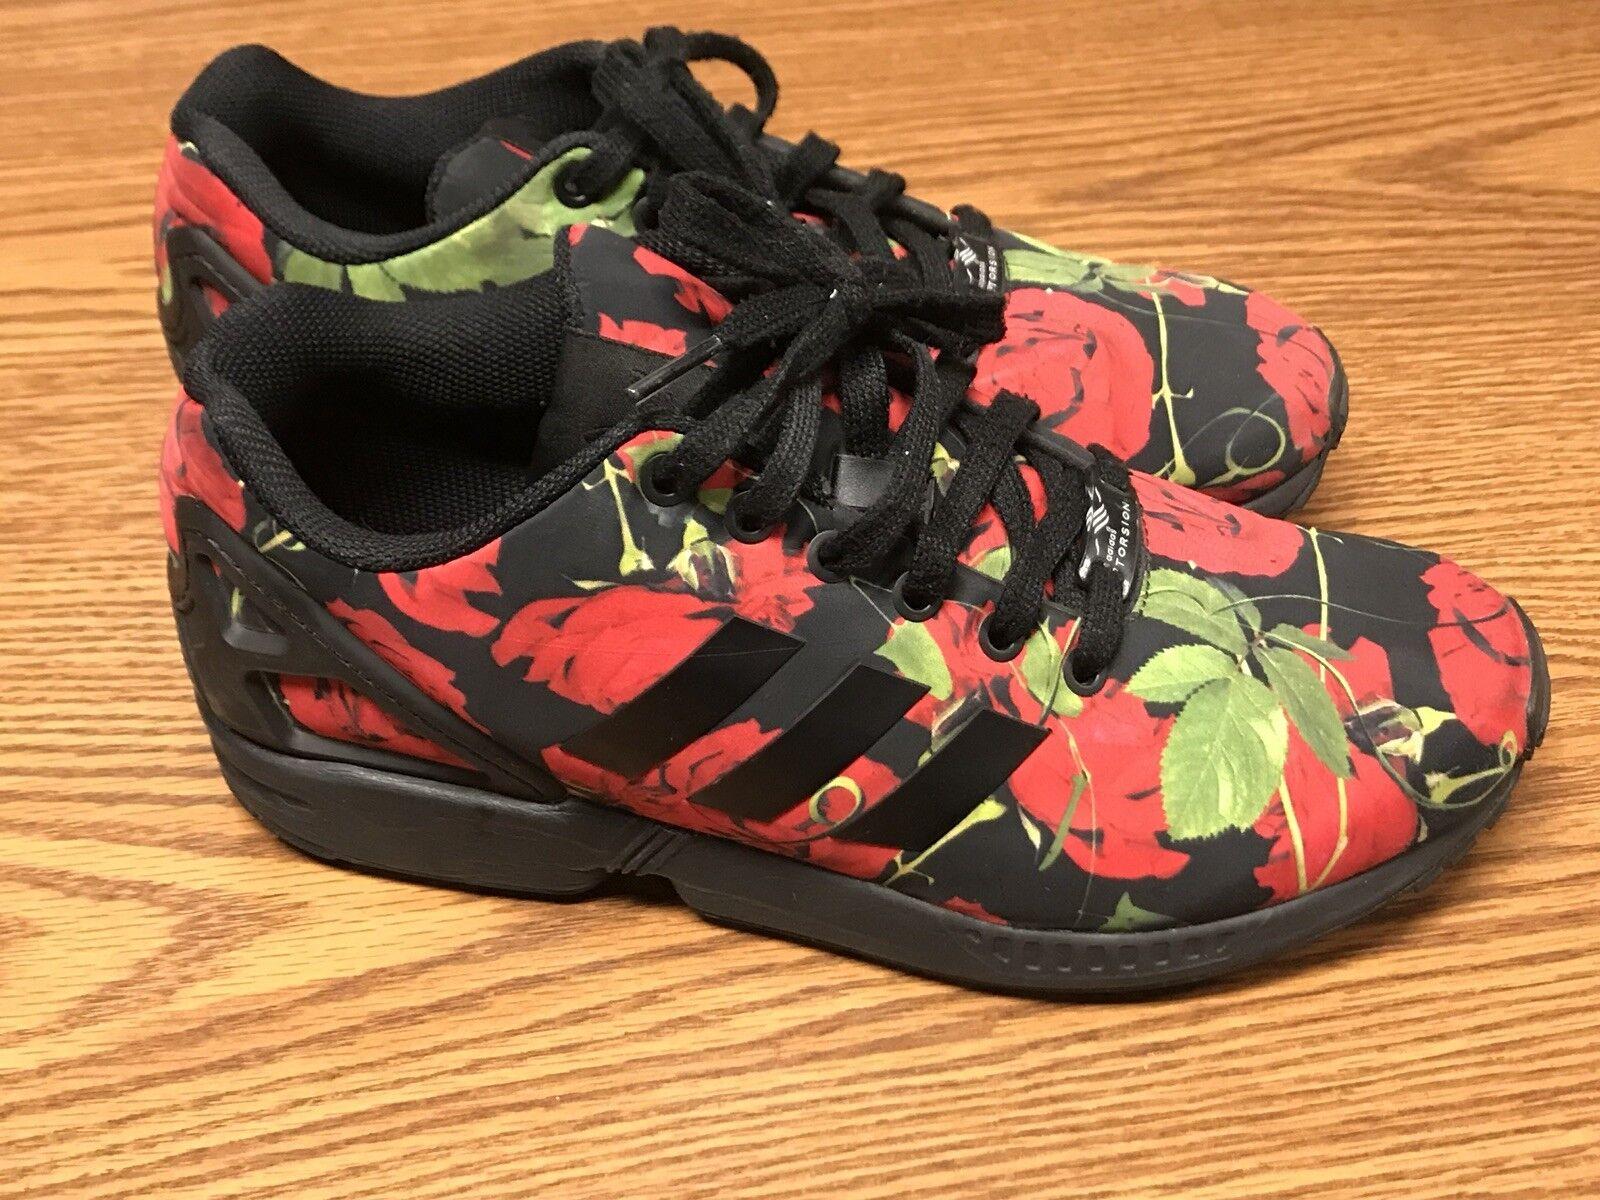 Adidas AQ4752 Originals ZX Flux Women's Black Red Roses Athletic Sneakers Sz 9.5